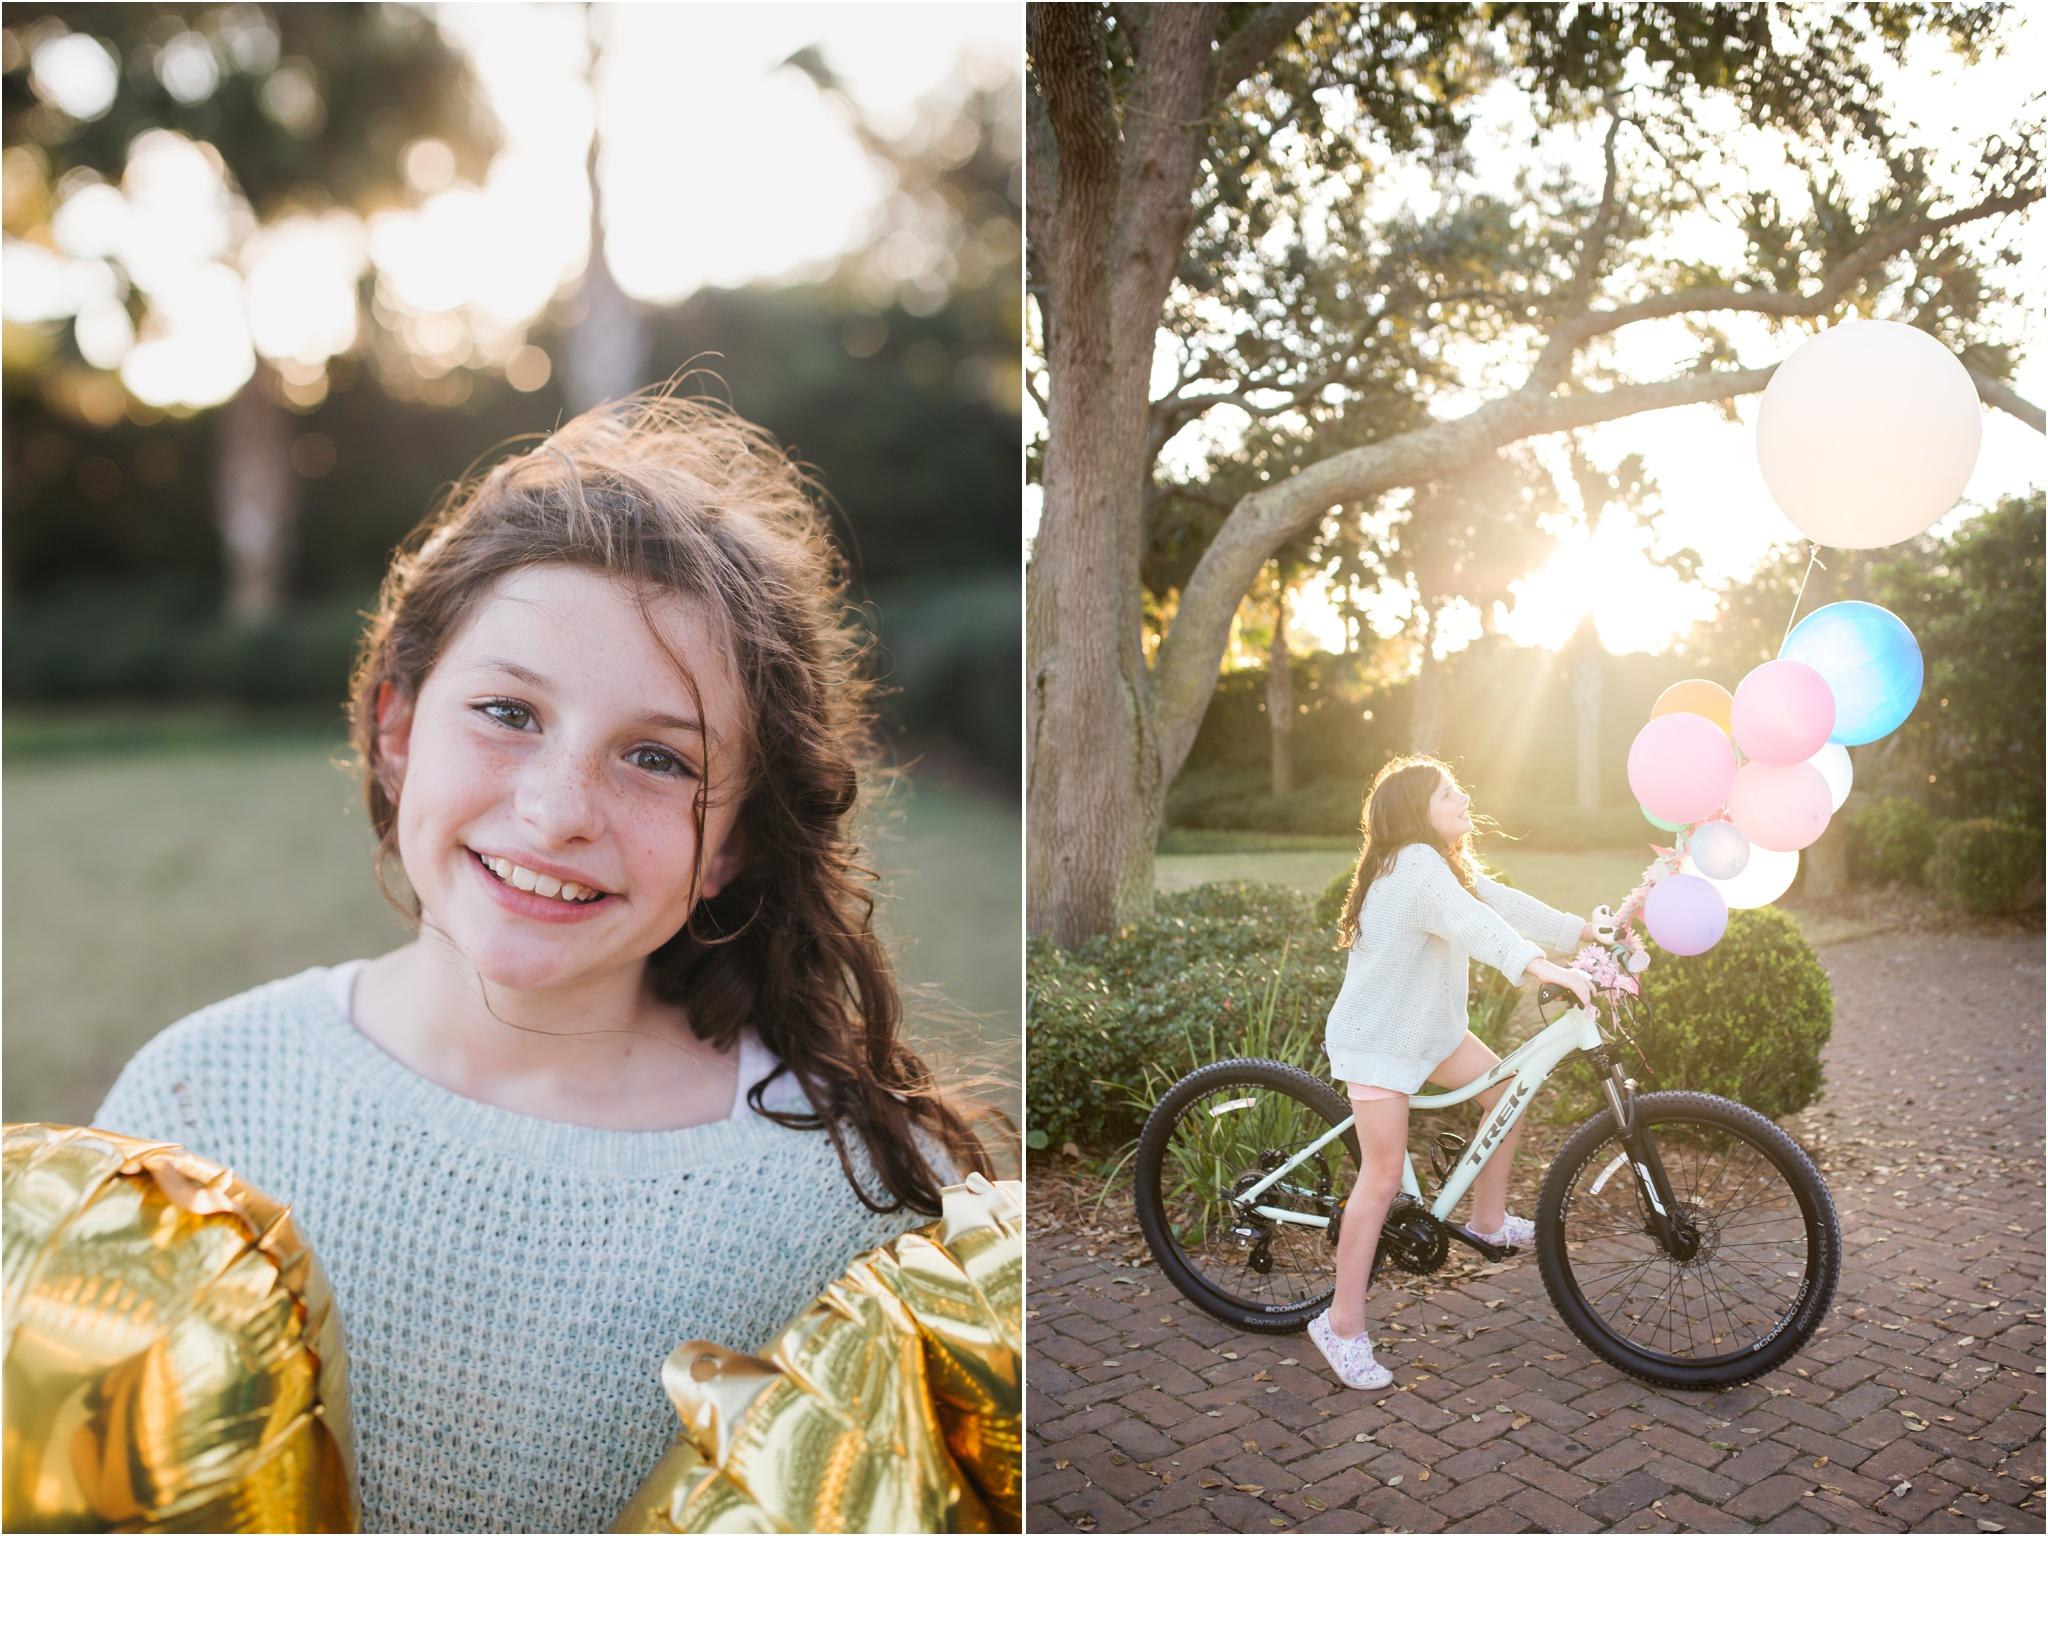 Rainey_Gregg_Photography_St._Simons_Island_Georgia_California_Wedding_Portrait_Photography_1385.jpg